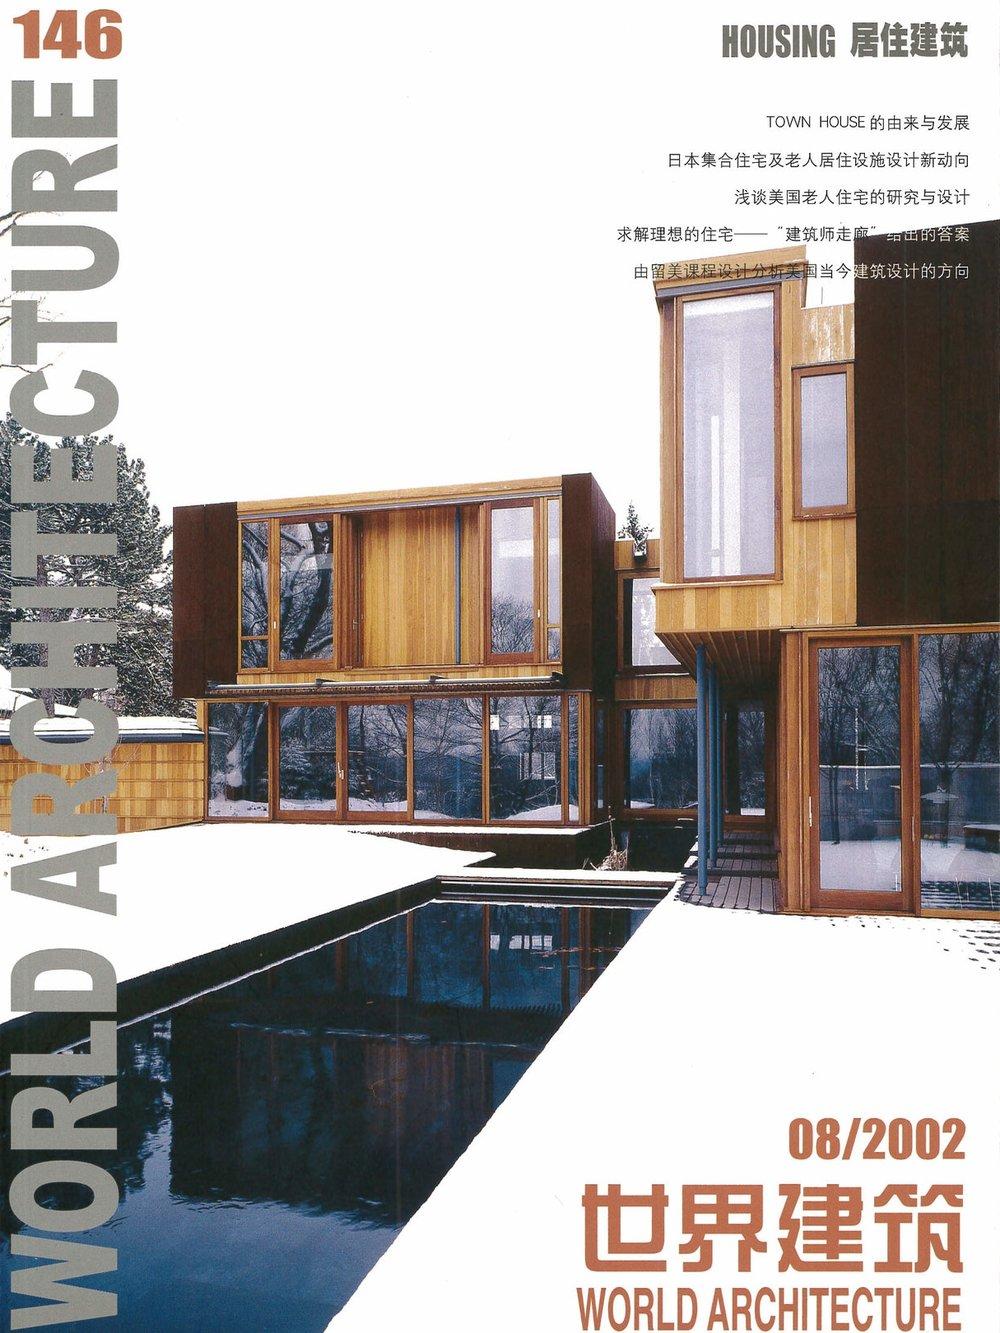 World Architecture Weathering Steel.jpg